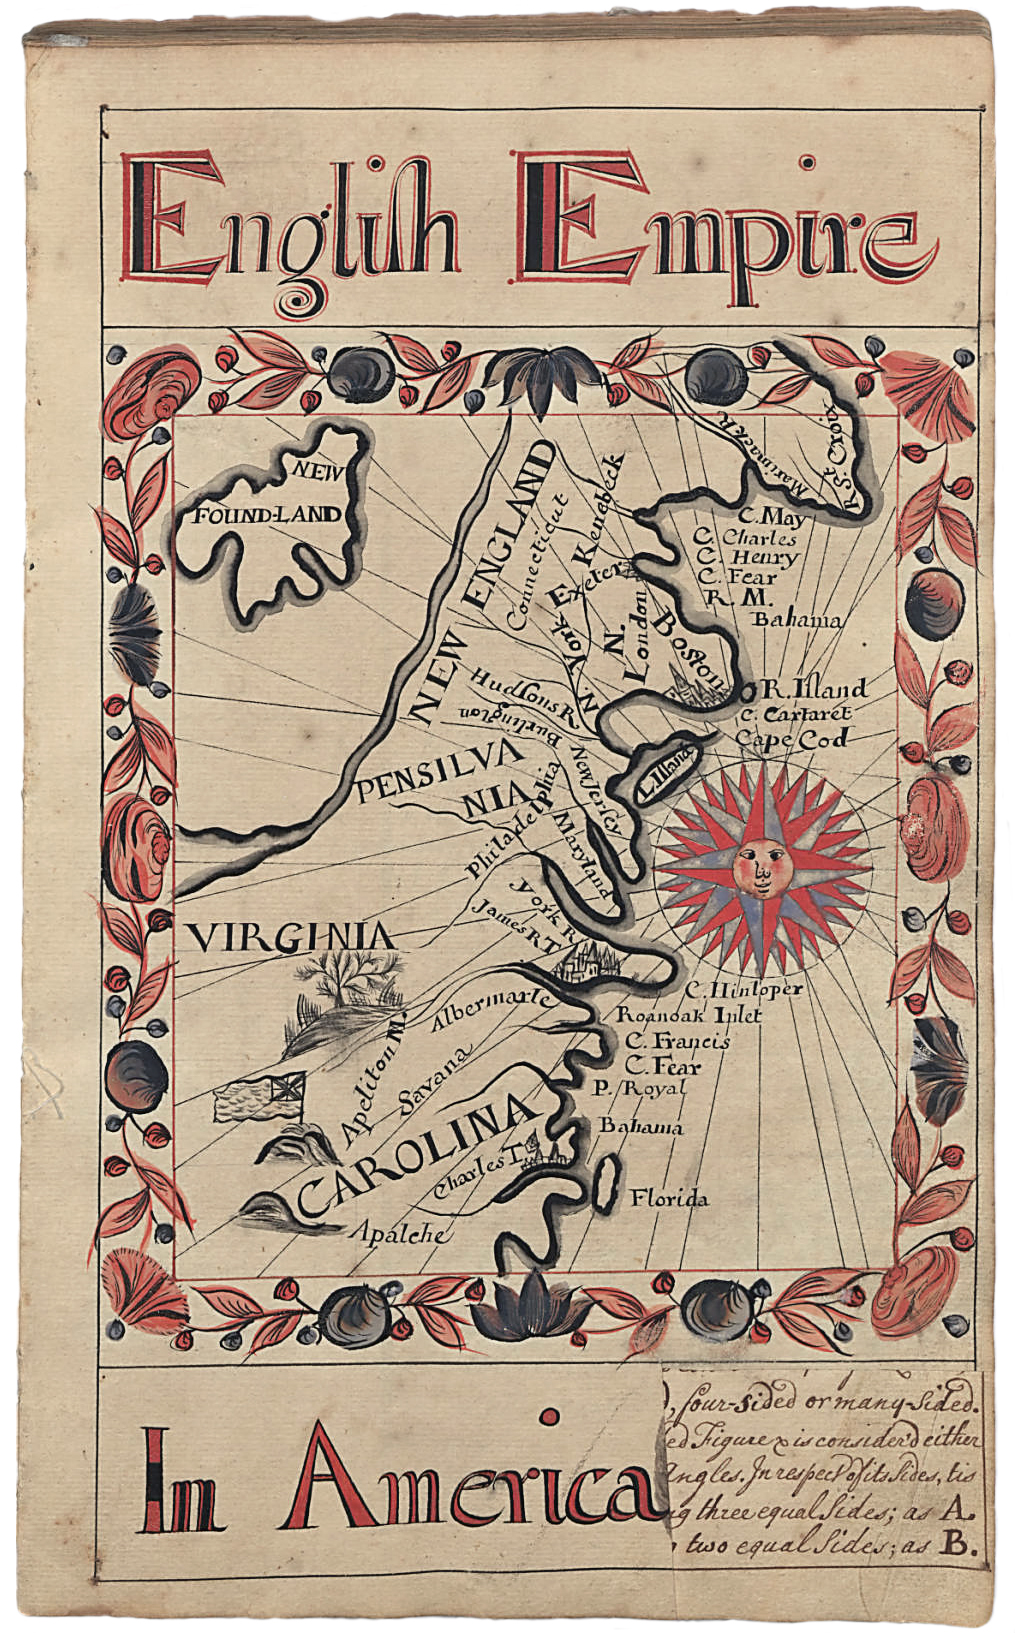 Thomas Earl, English Empire, from his 1727 copybook